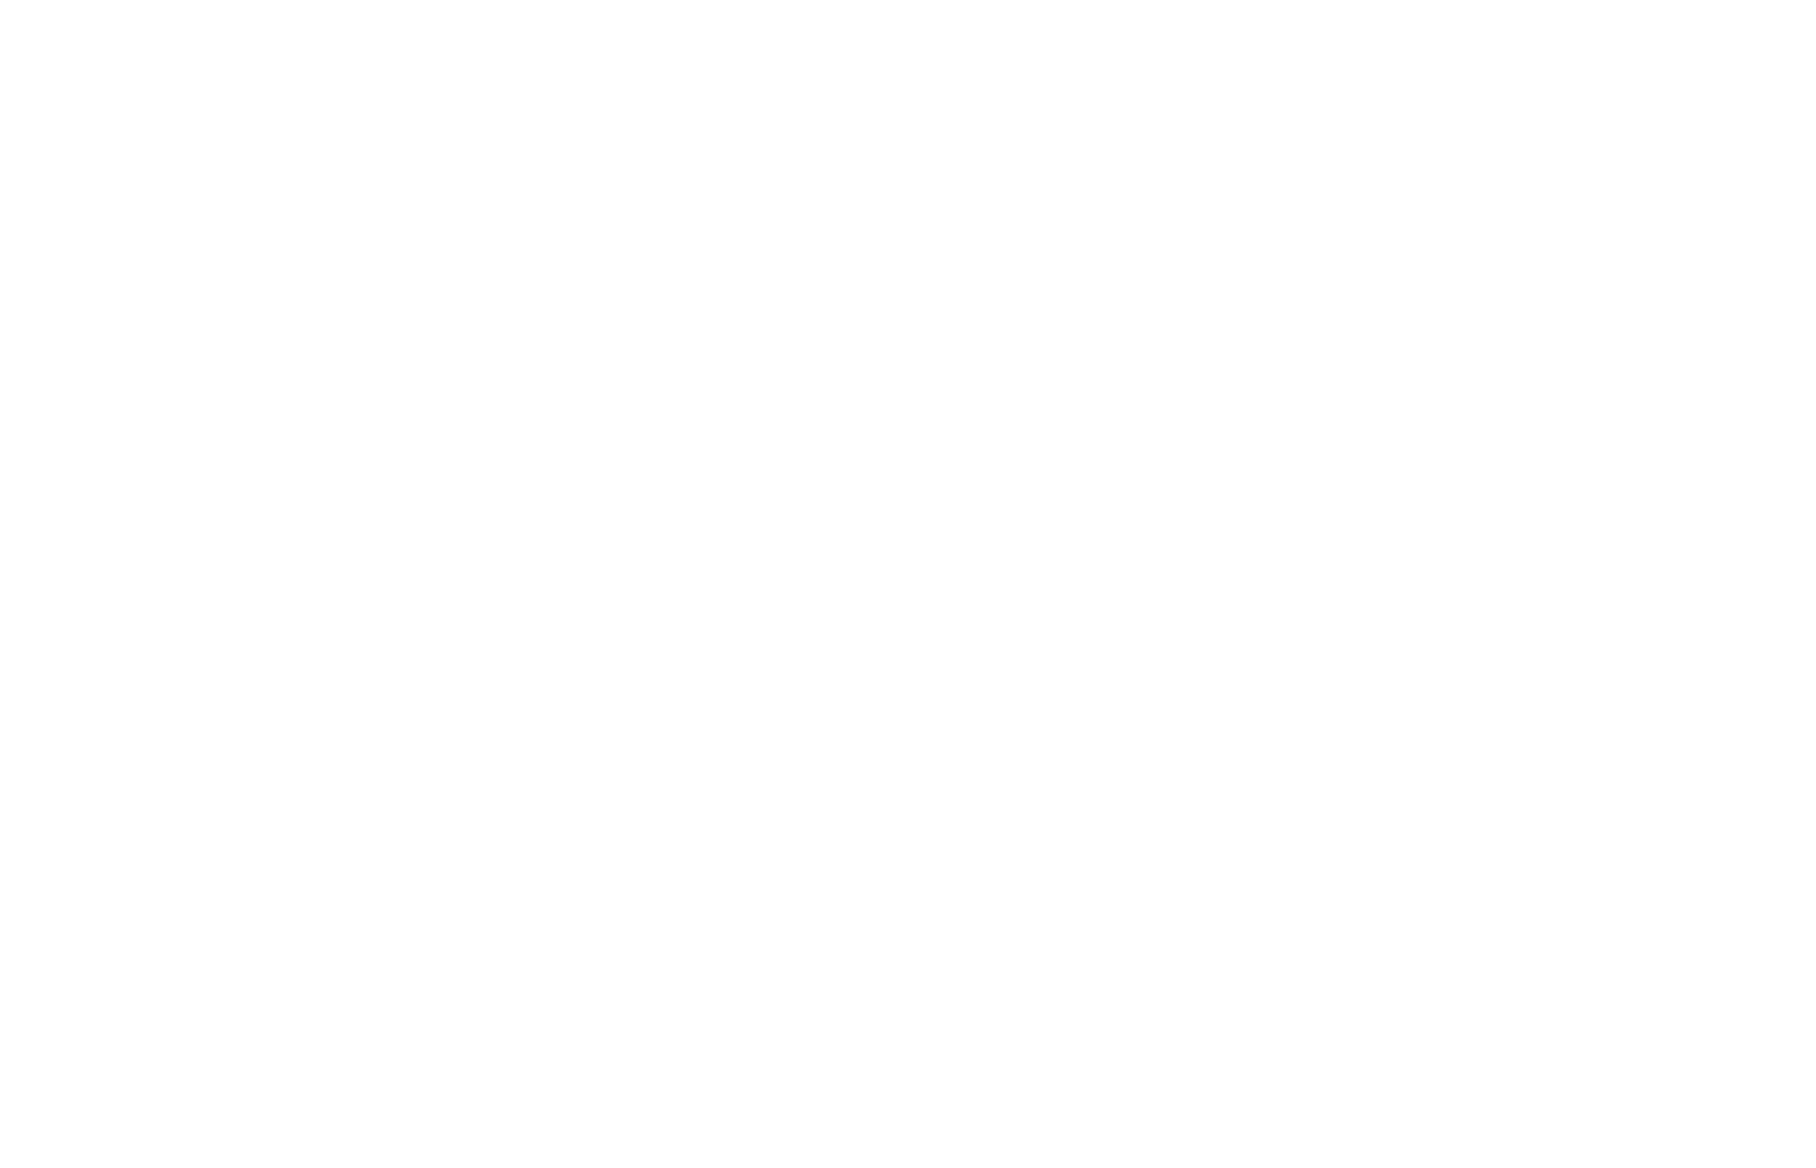 Jere-Satamo-logo-mark.png